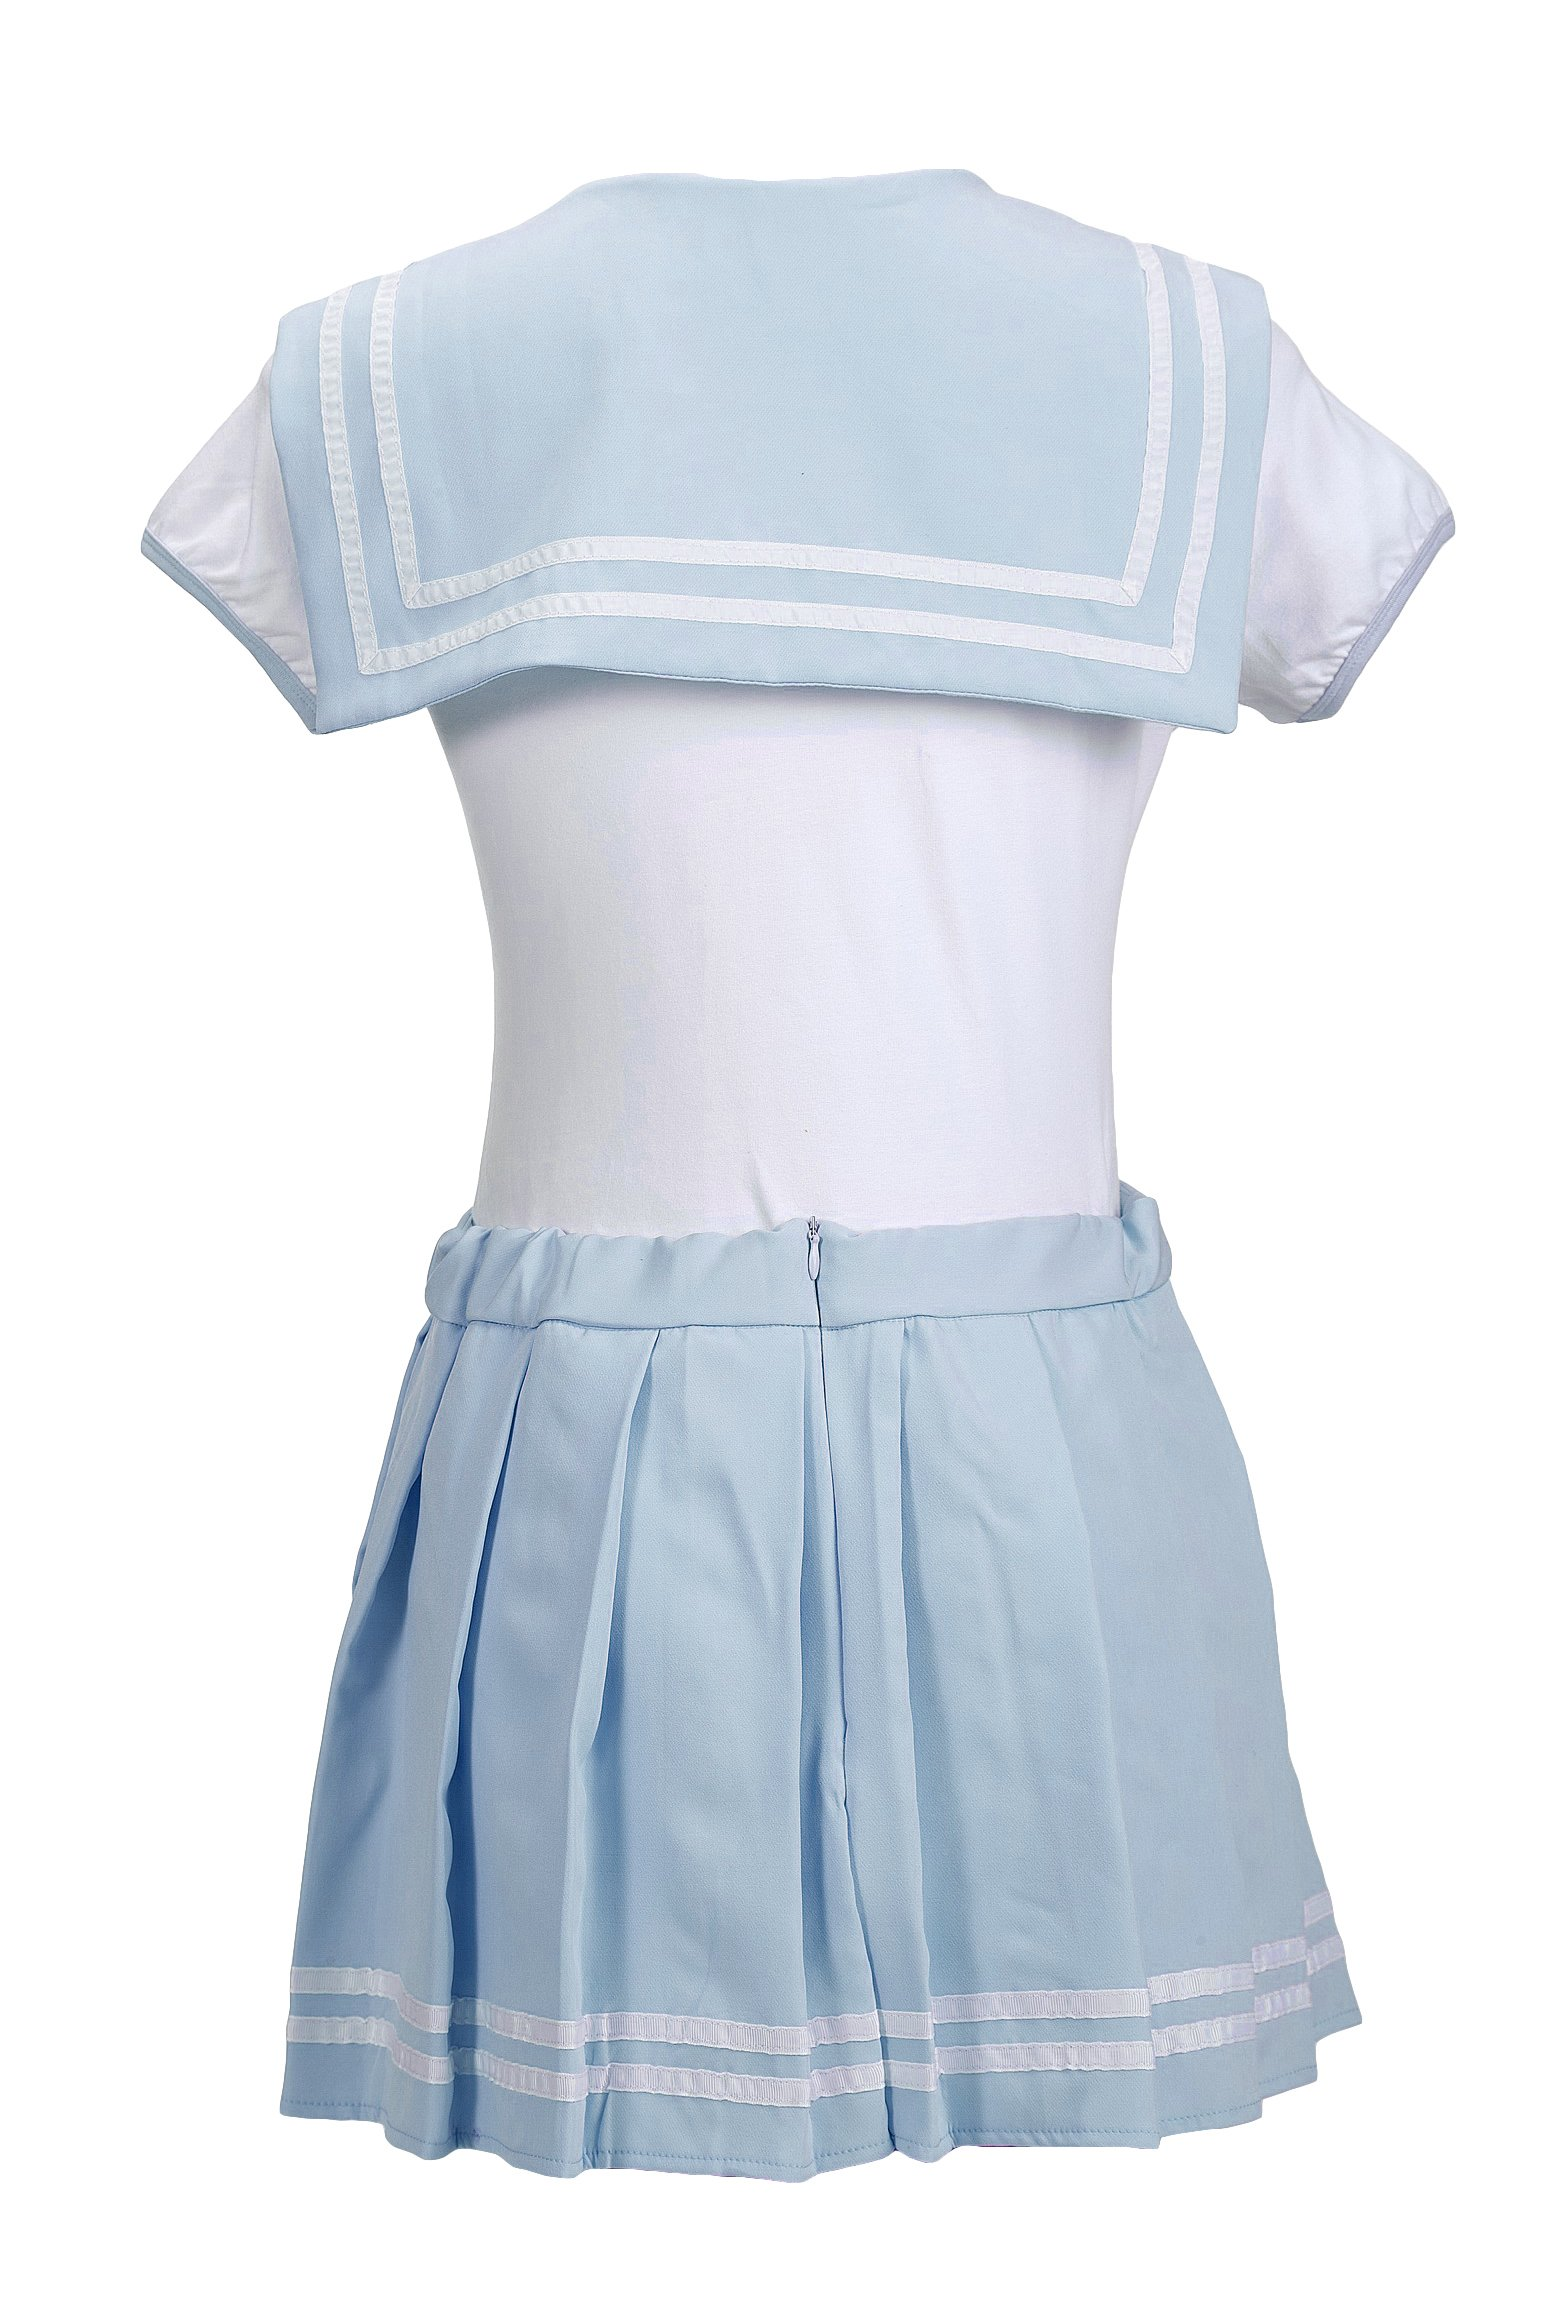 7d1837fdb272 Littleforbig Adult Baby Onesie Diaper Lover (ABDL) Snap Crotch Romper  Onesie Pajamas - Cosplay Magical Onesie Skirt Set Blue S - LA01-LB-013TB-S    Jumpsuits ...